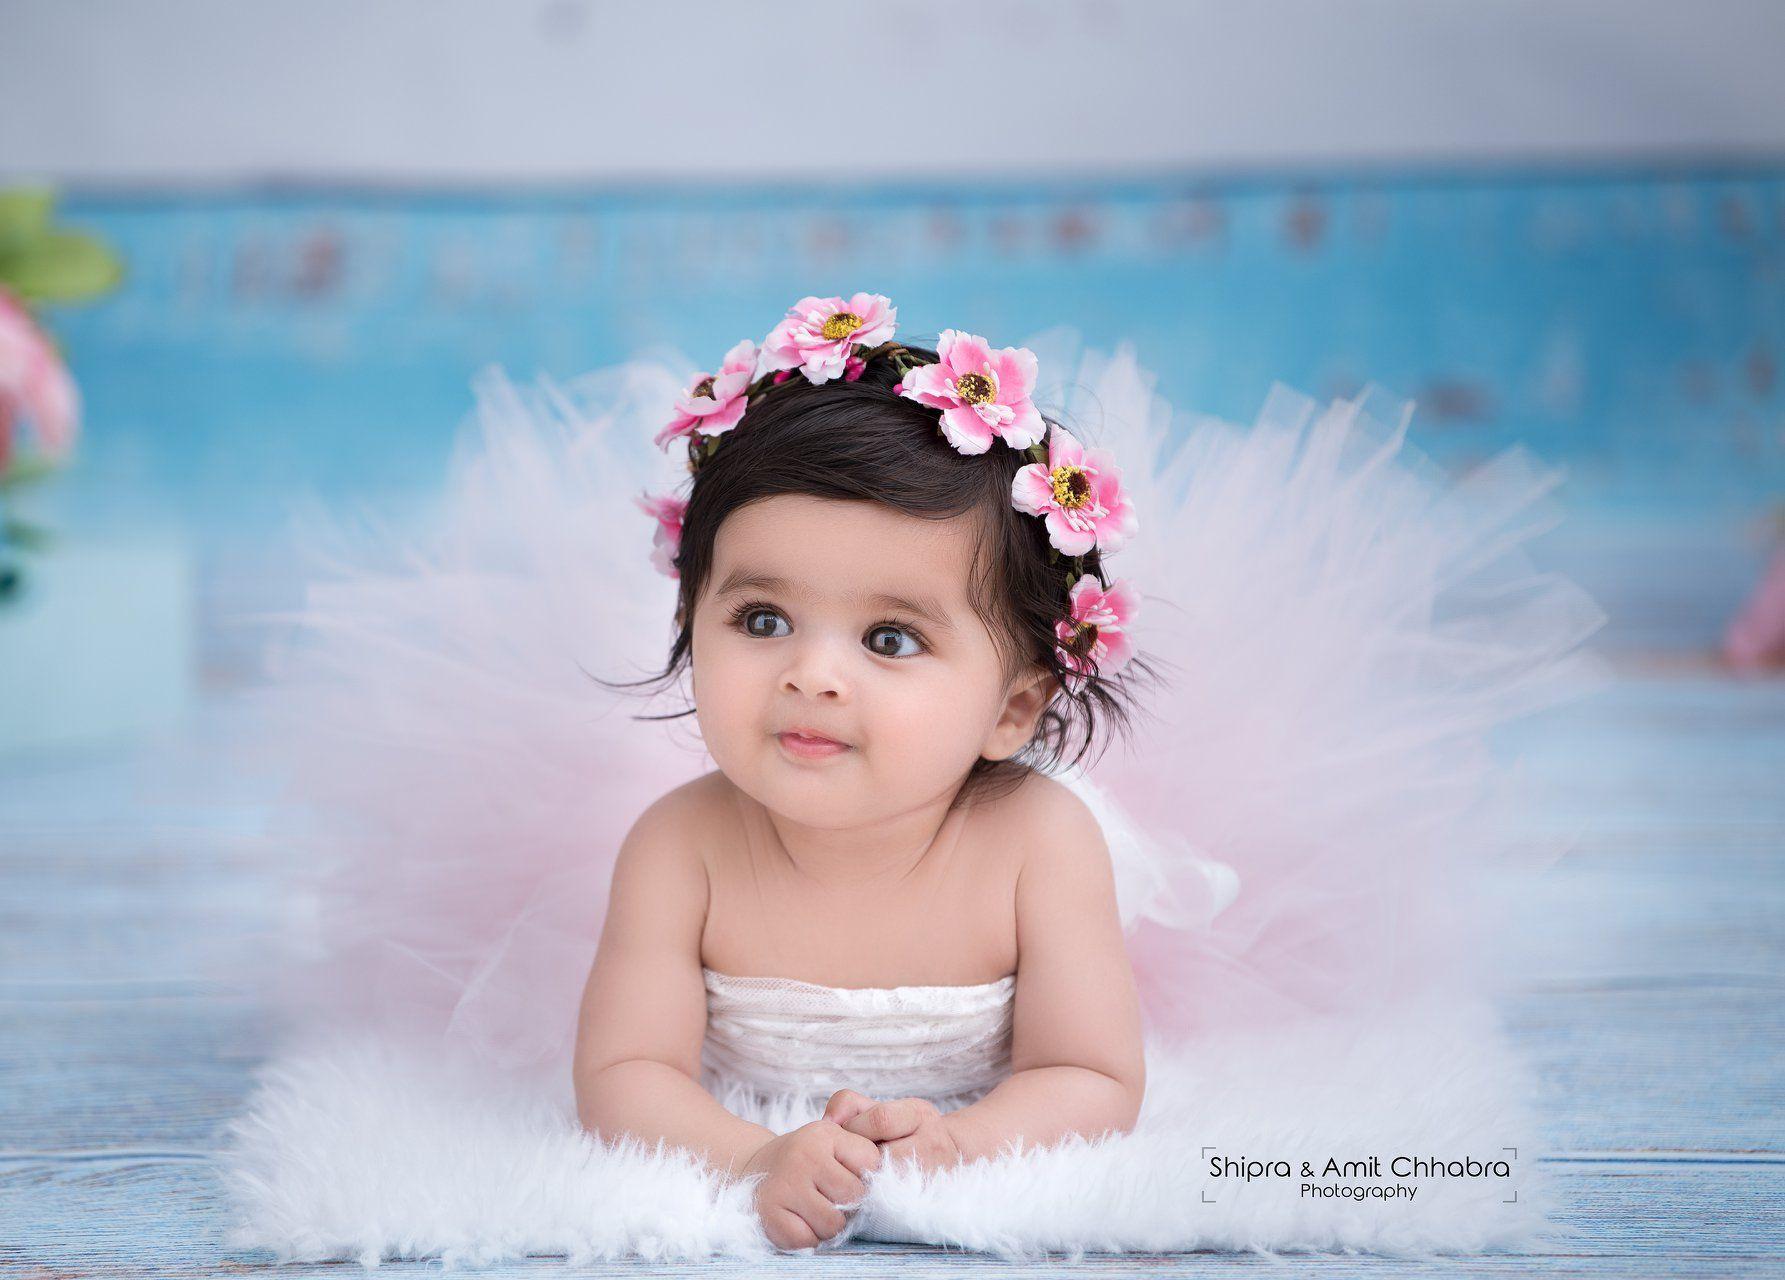 Infant photo shoot baby girl 6 month baby photo shoot ideas tiara floral tiara tutu skirt shipra amit chhabra photography